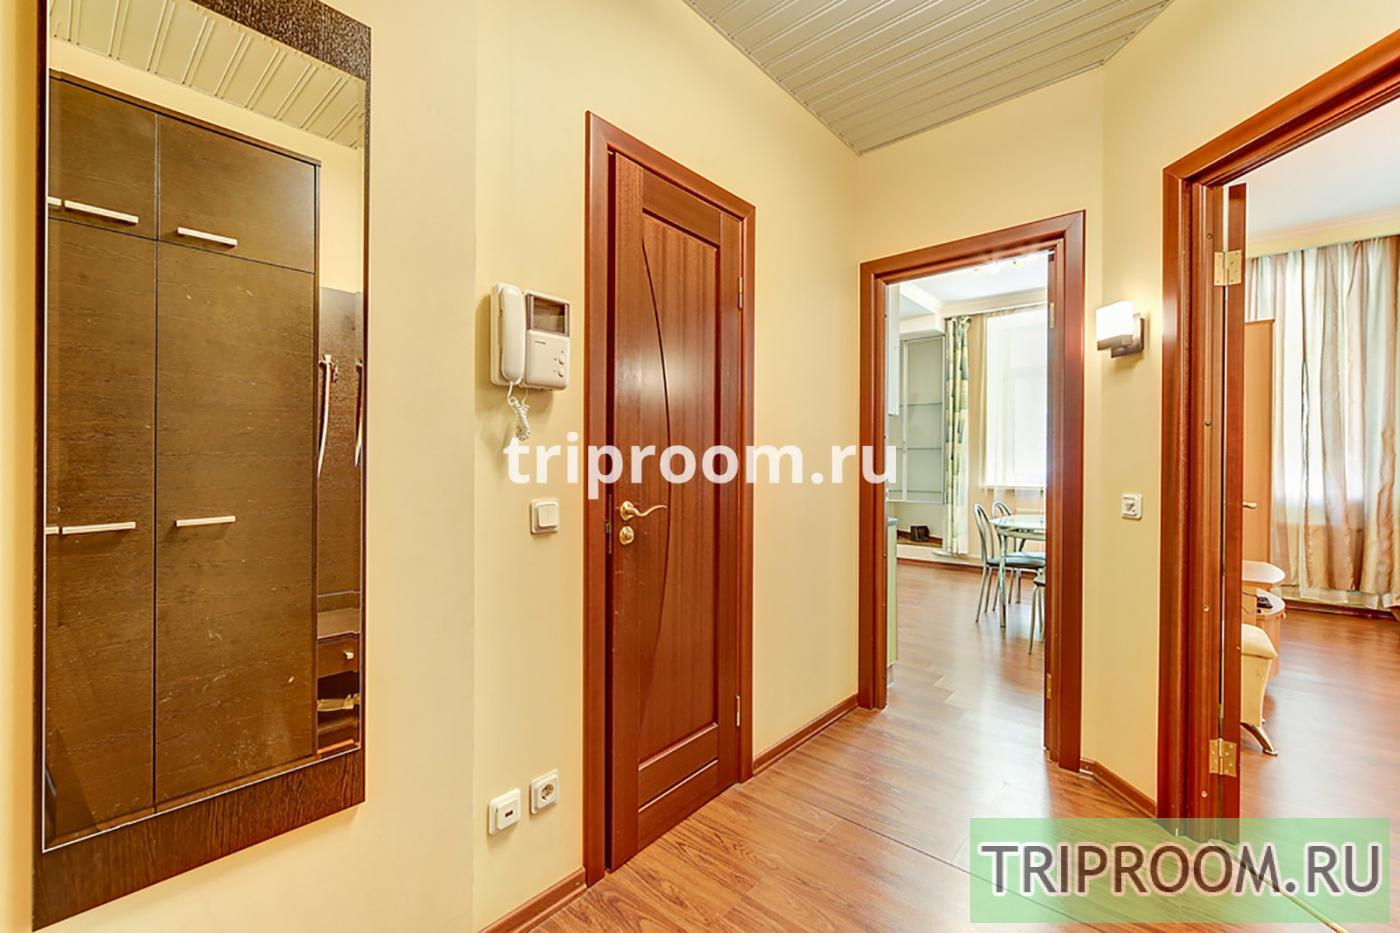 1-комнатная квартира посуточно (вариант № 15527), ул. Канала Грибоедова набережная, фото № 15